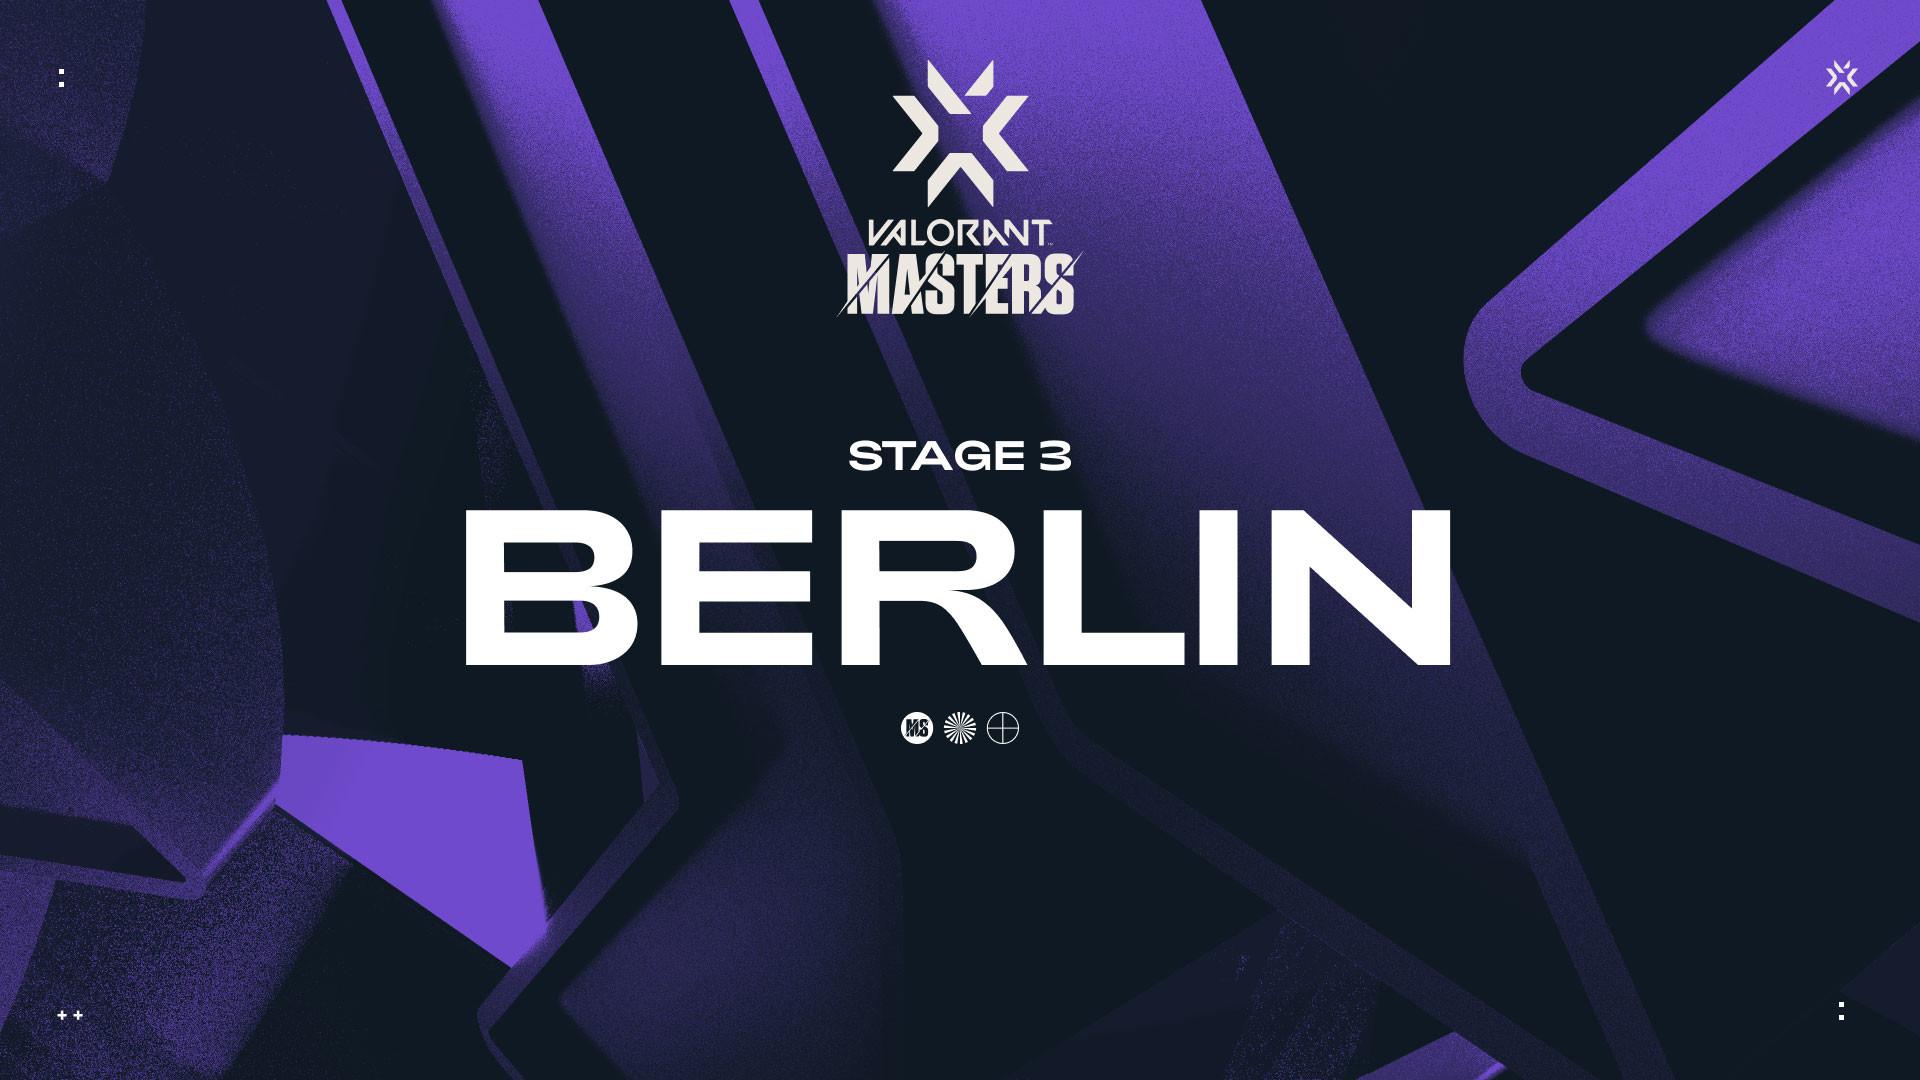 VCT Masters Berlin : La phase de groupes